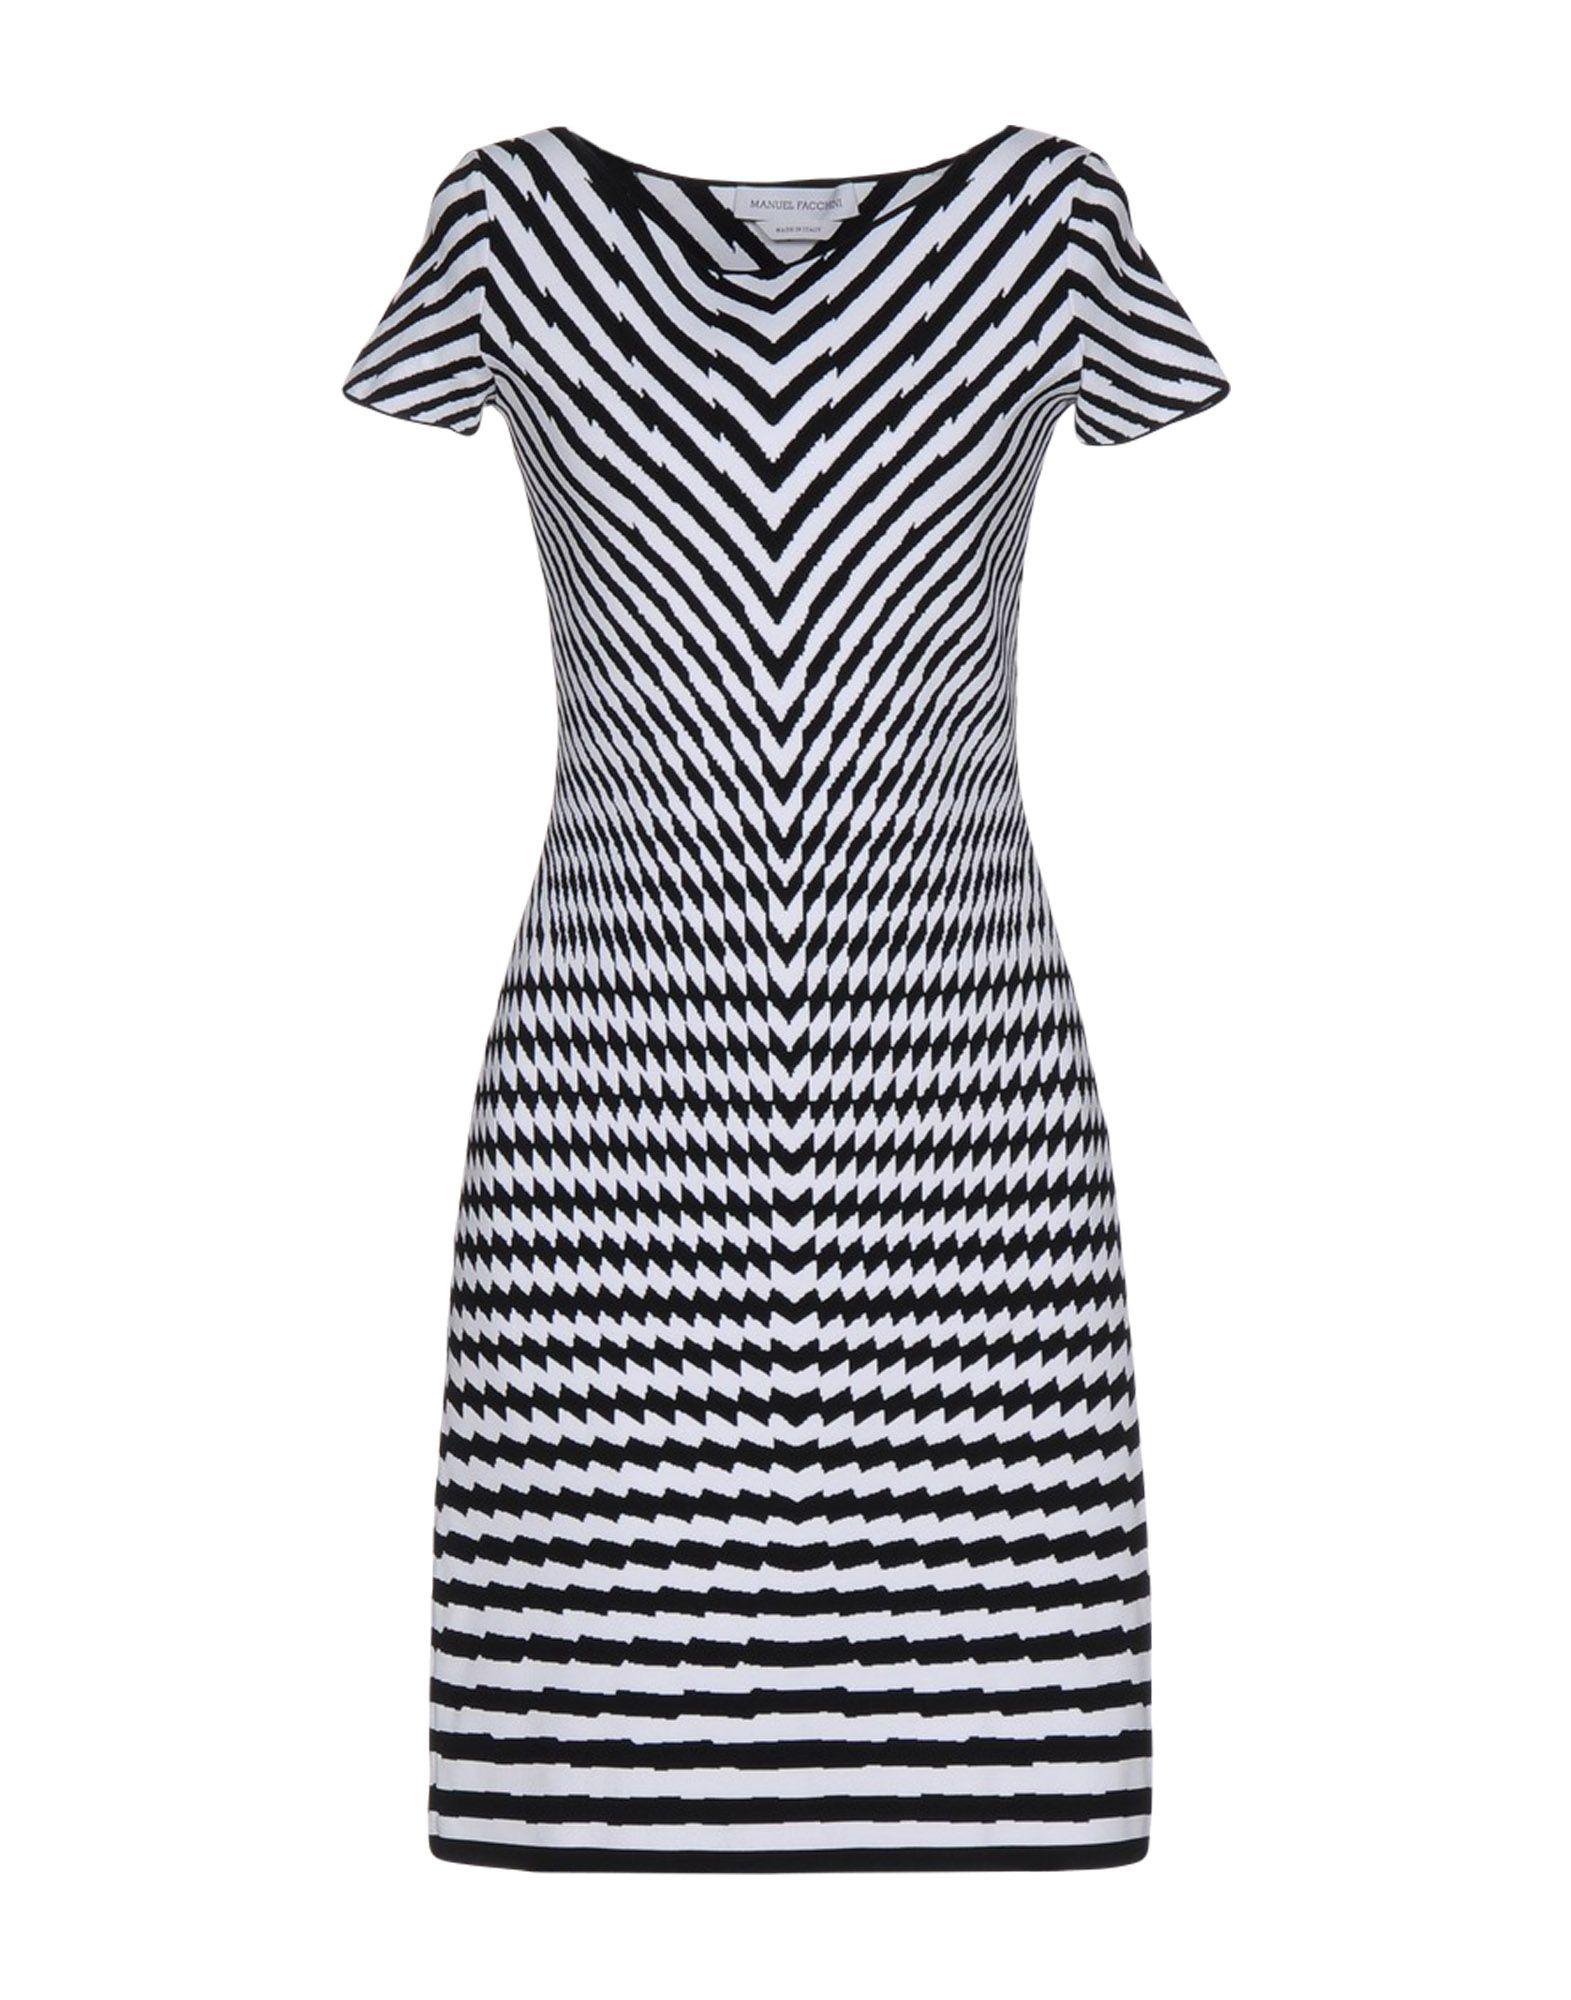 MANUEL FACCHINI Short Dresses in White